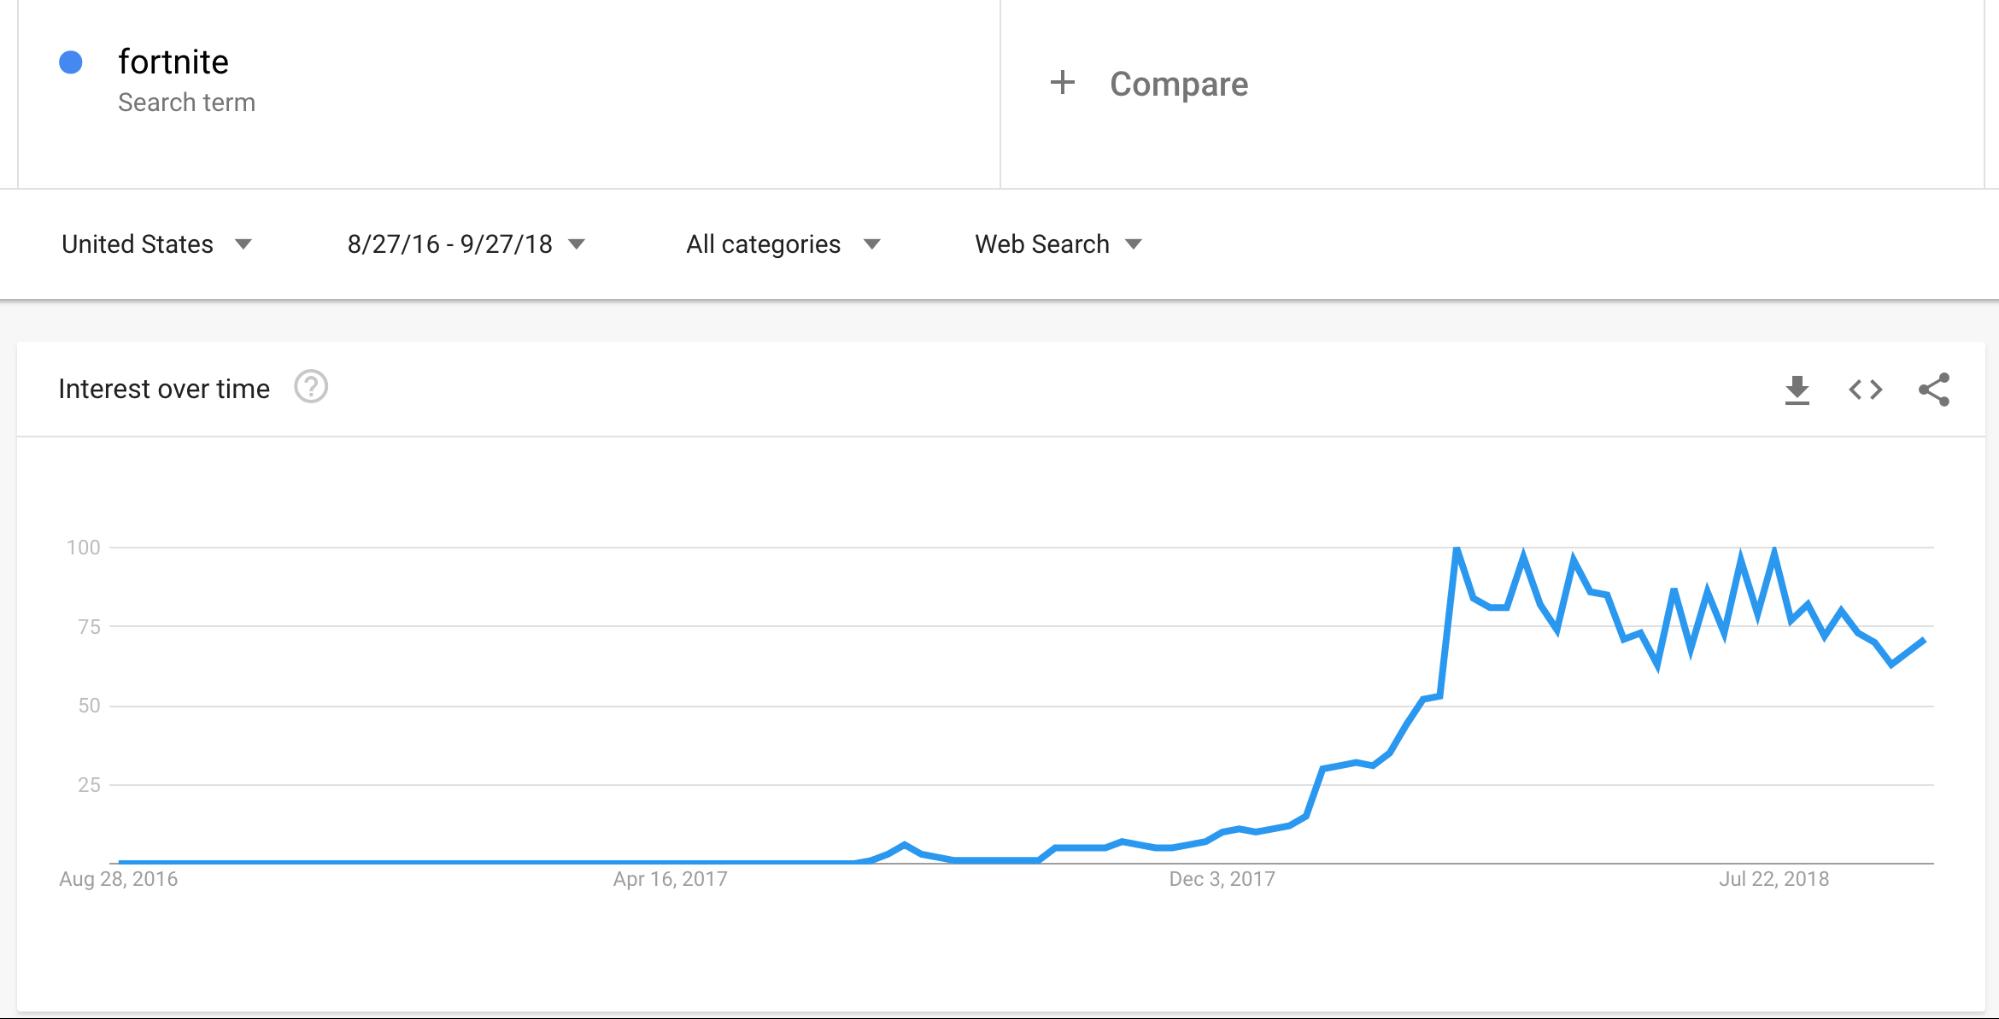 Fortnite Popularity Graph